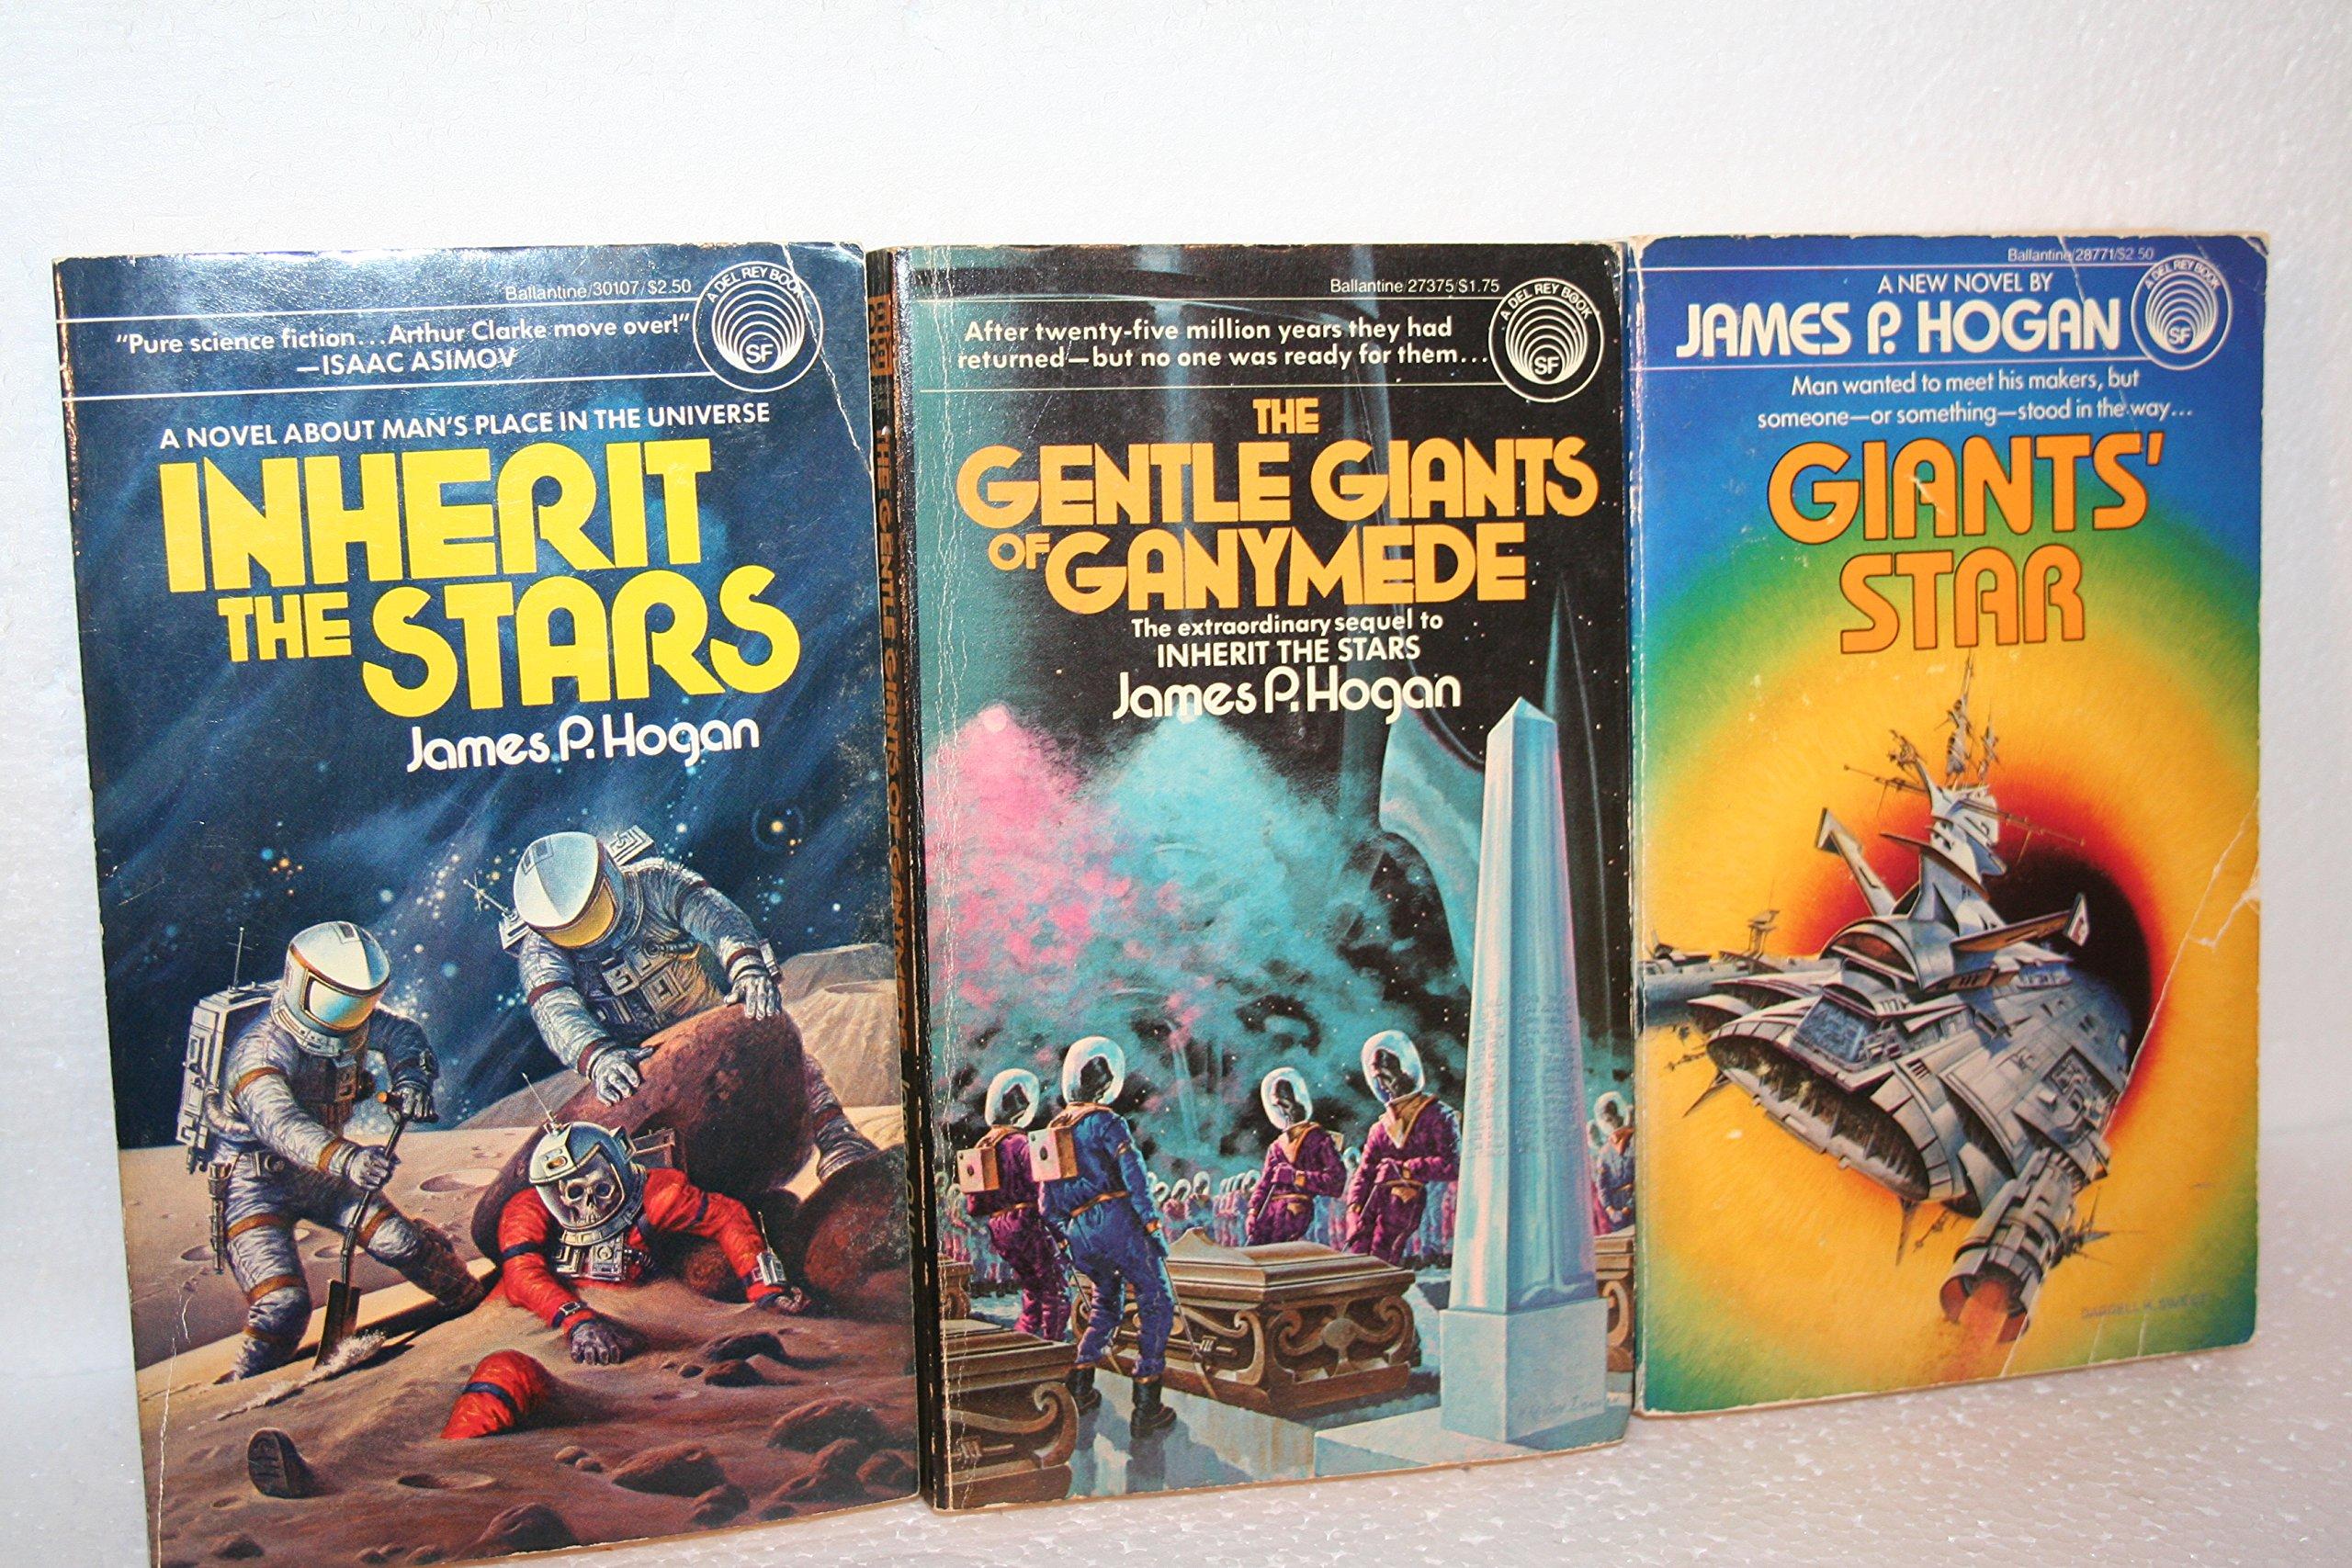 The Giants Novels Giants 1 3 By James P Hogan